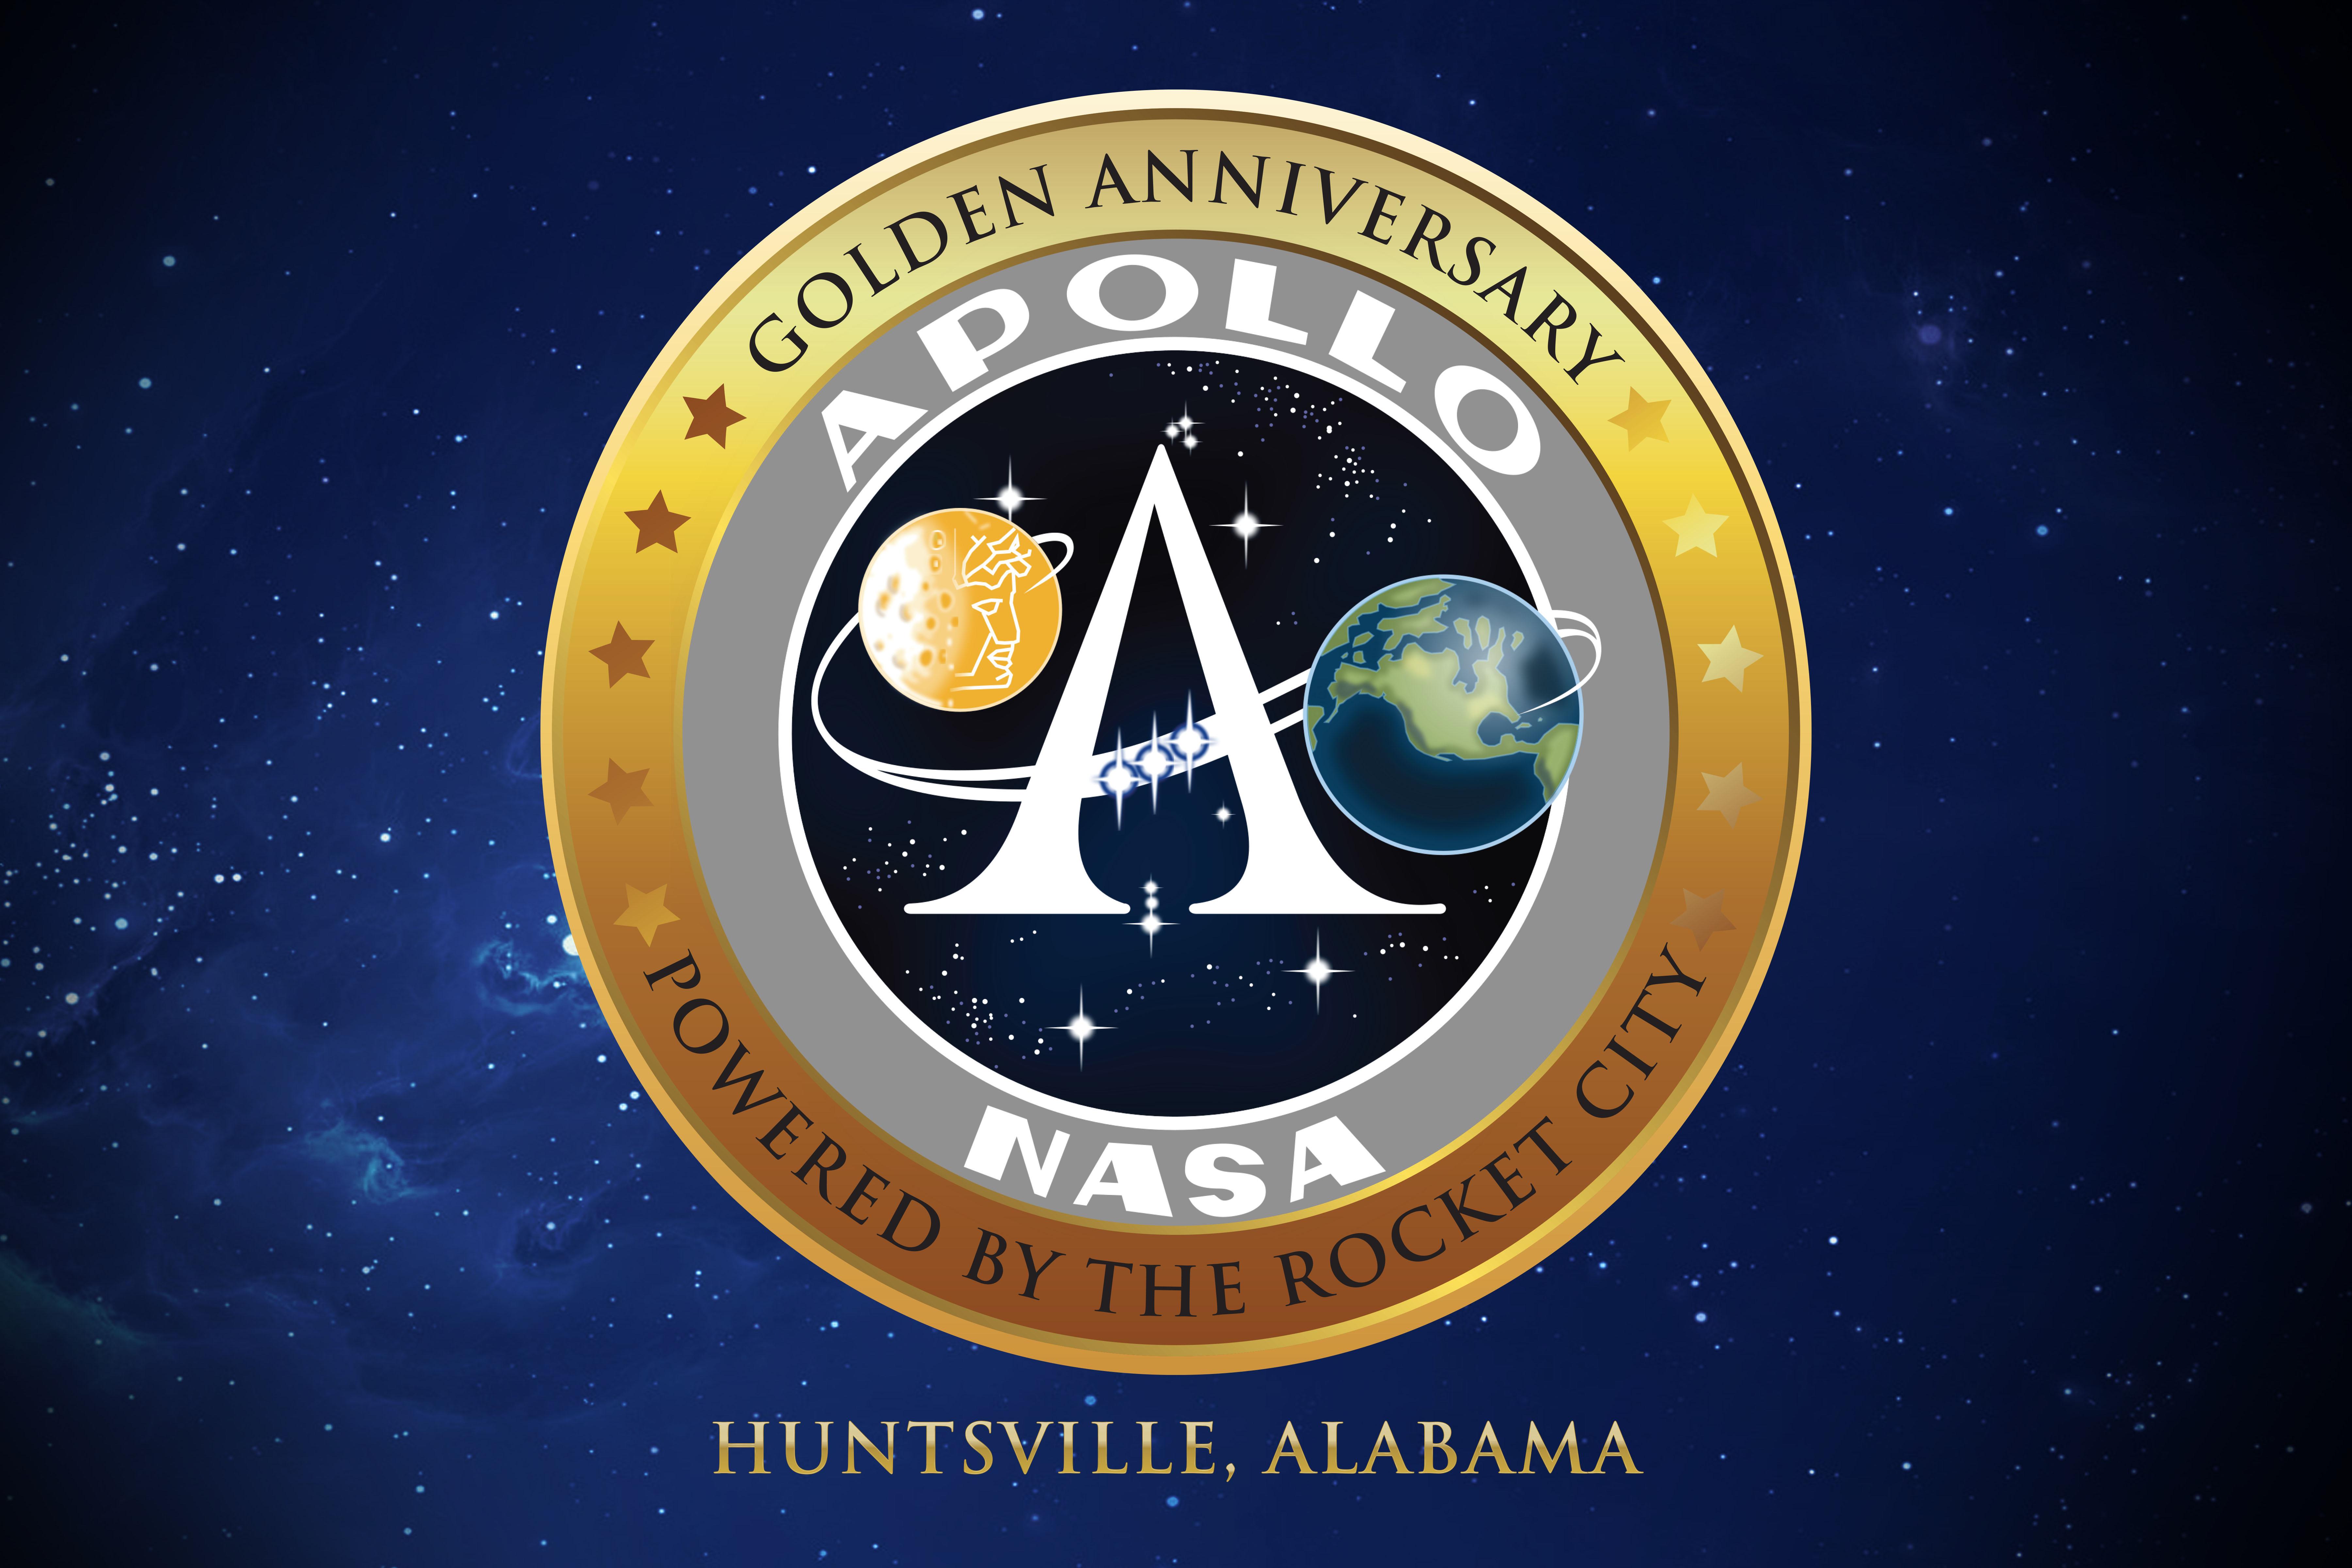 6a98899b90e Apollo 11 50th Anniversary Celebration Moon Landing Reenactments